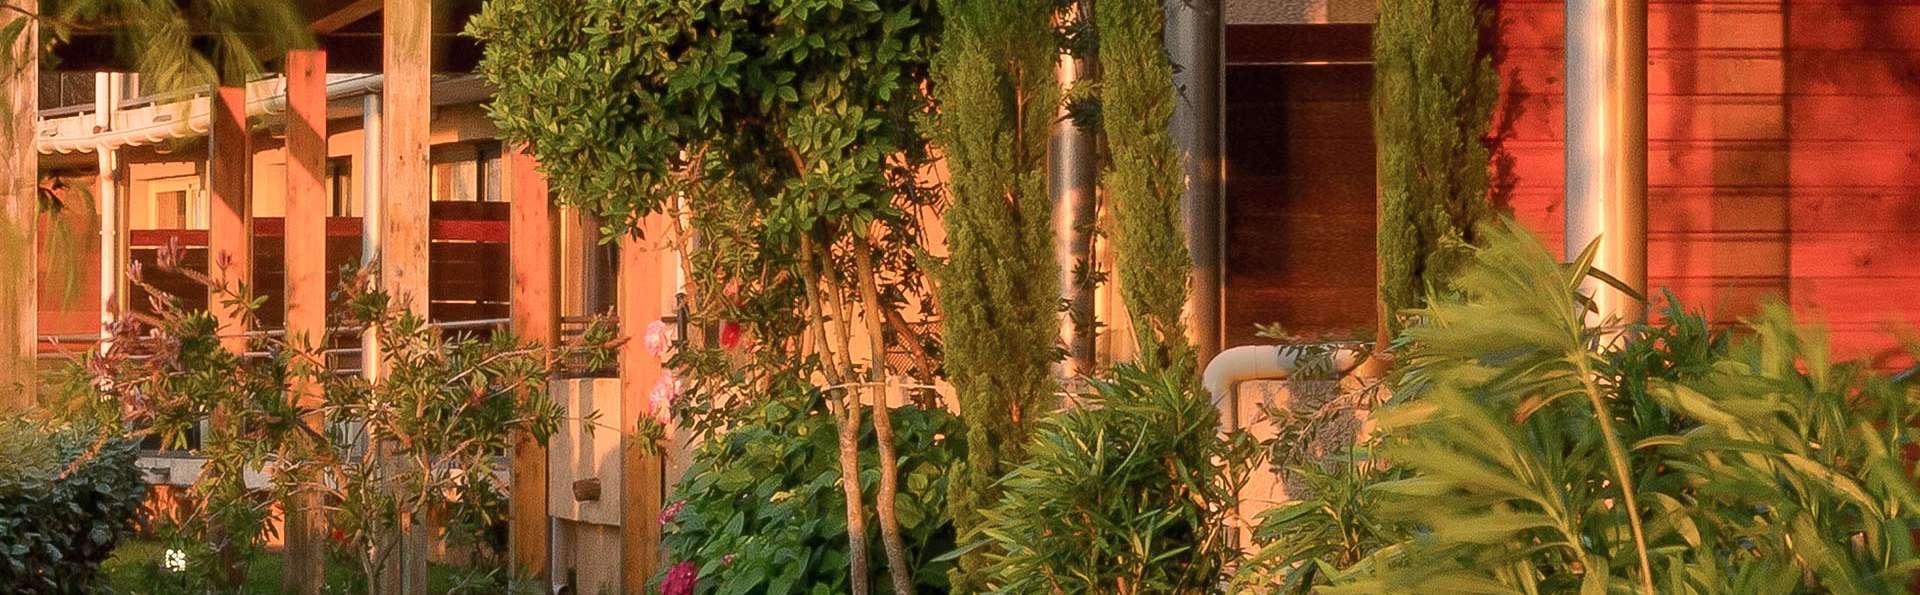 Best Western Hotel San Damianu - EDIT_FRONT_02.jpg